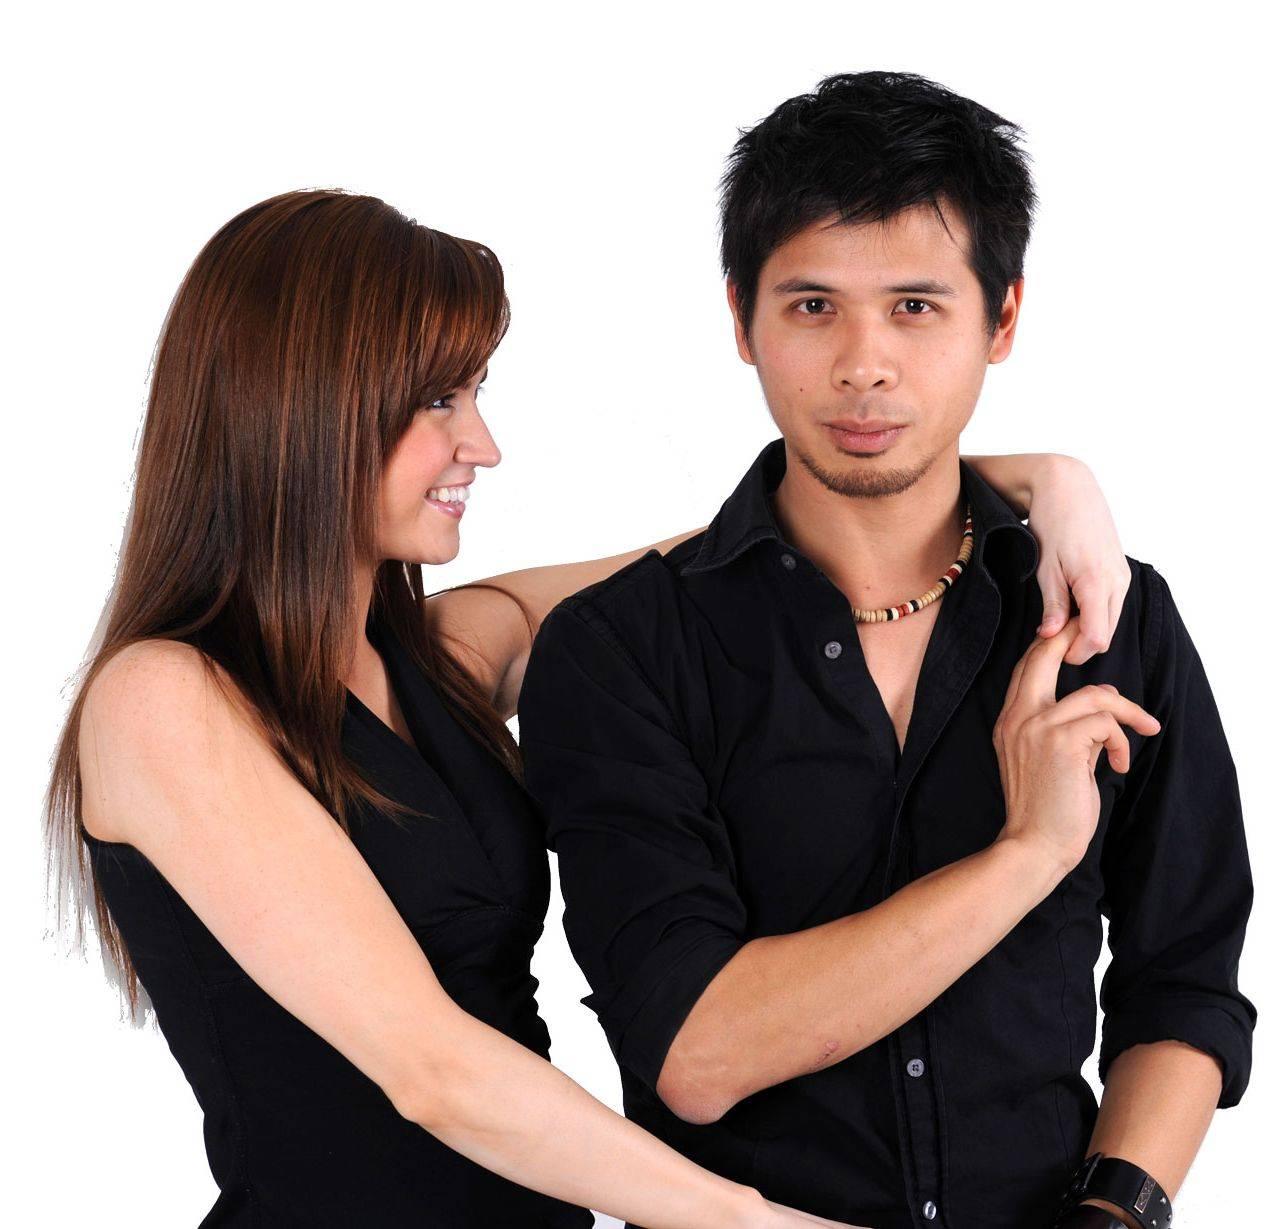 Club Dance Instructors - Men and Women